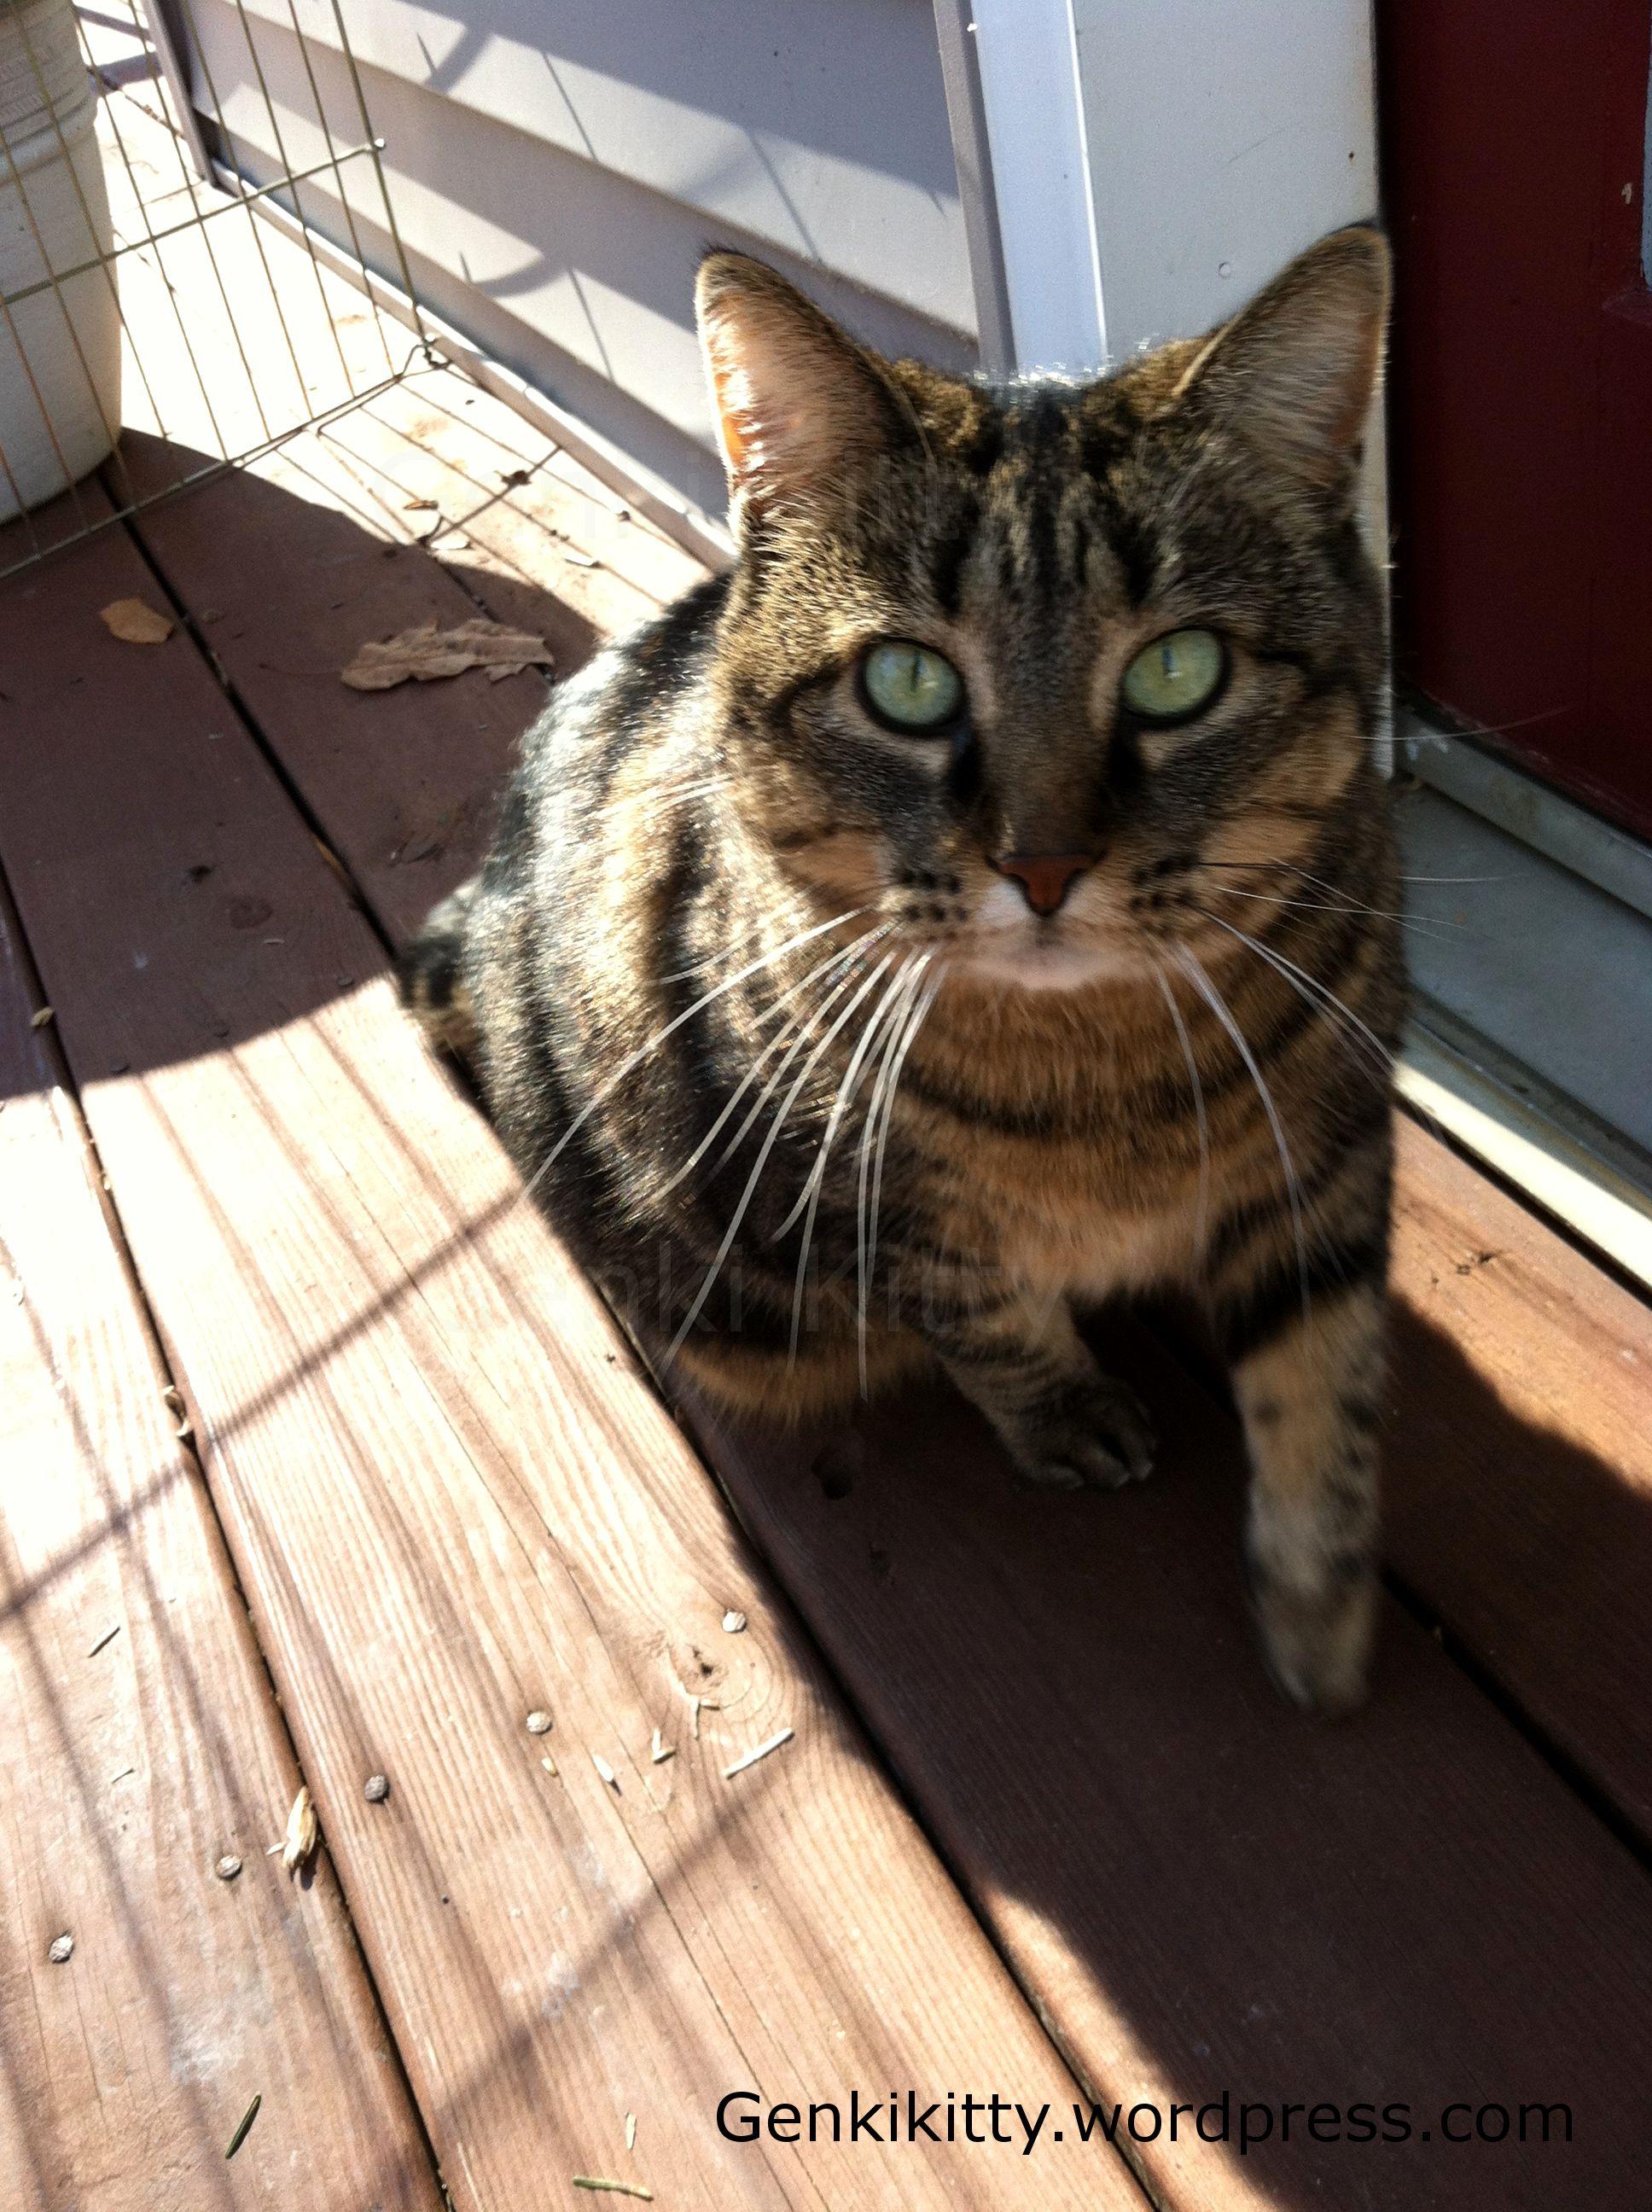 Genki Kitty enjoying the sunshine outside with me. She's